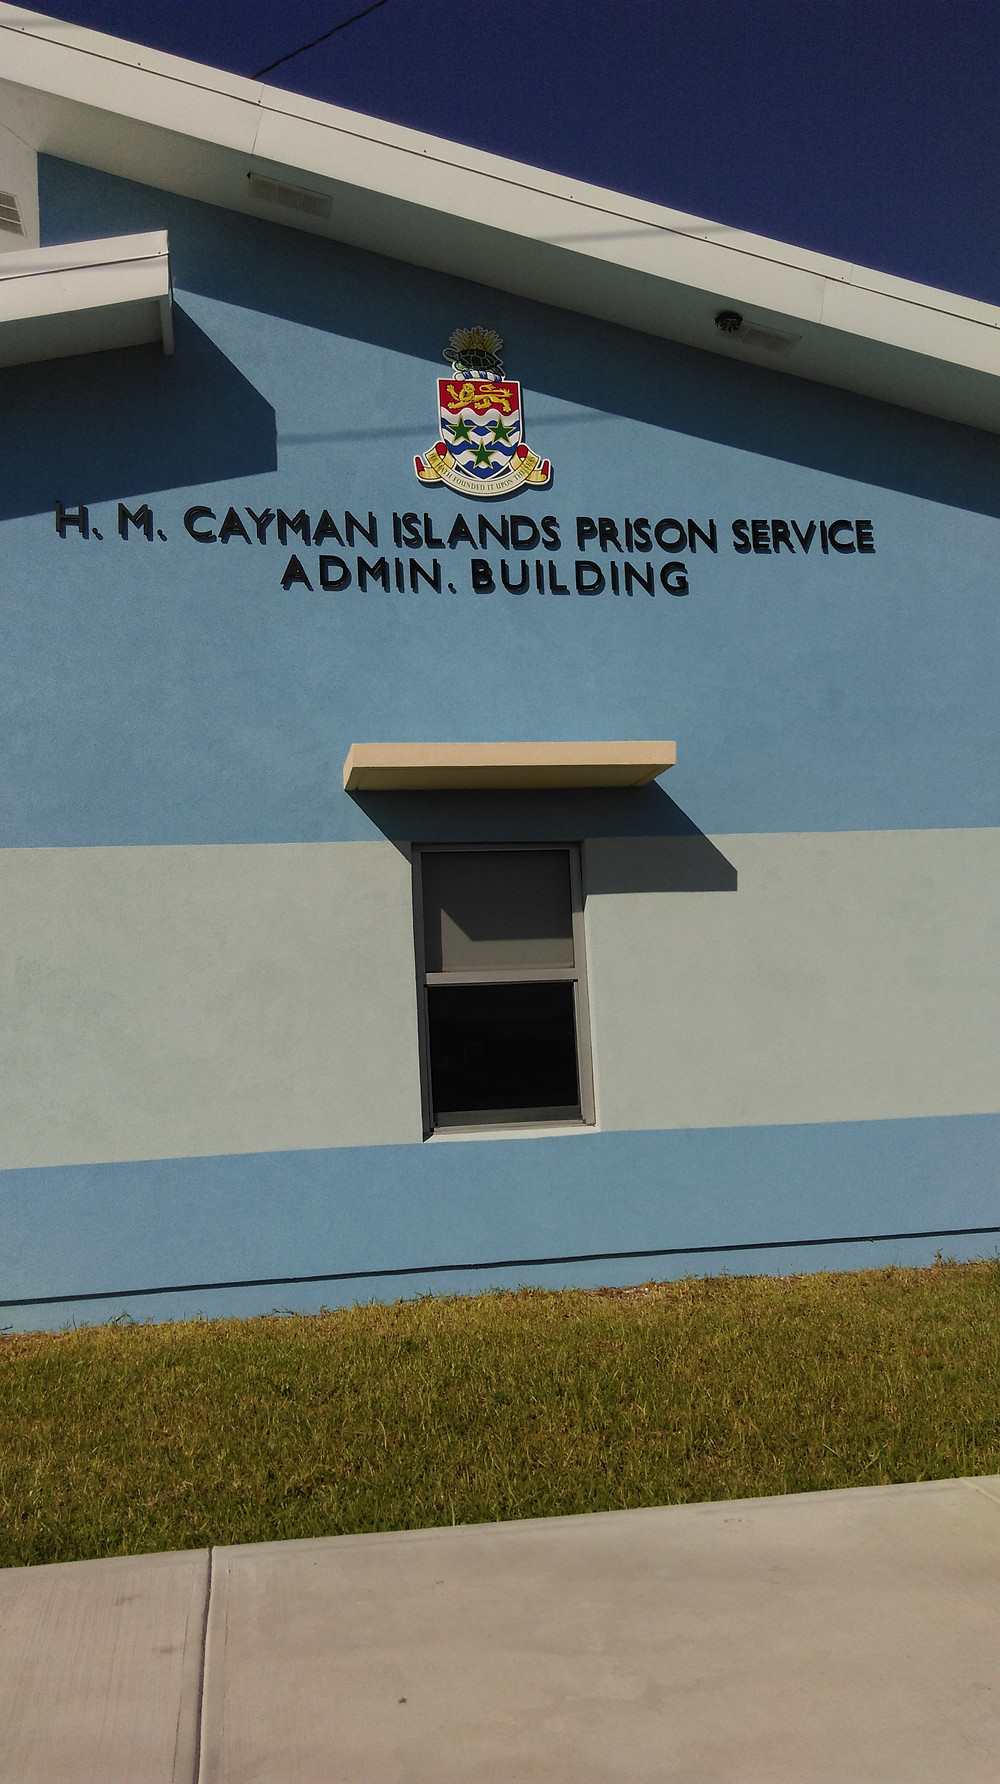 HM Cayman Islands Prison Service Admin Building